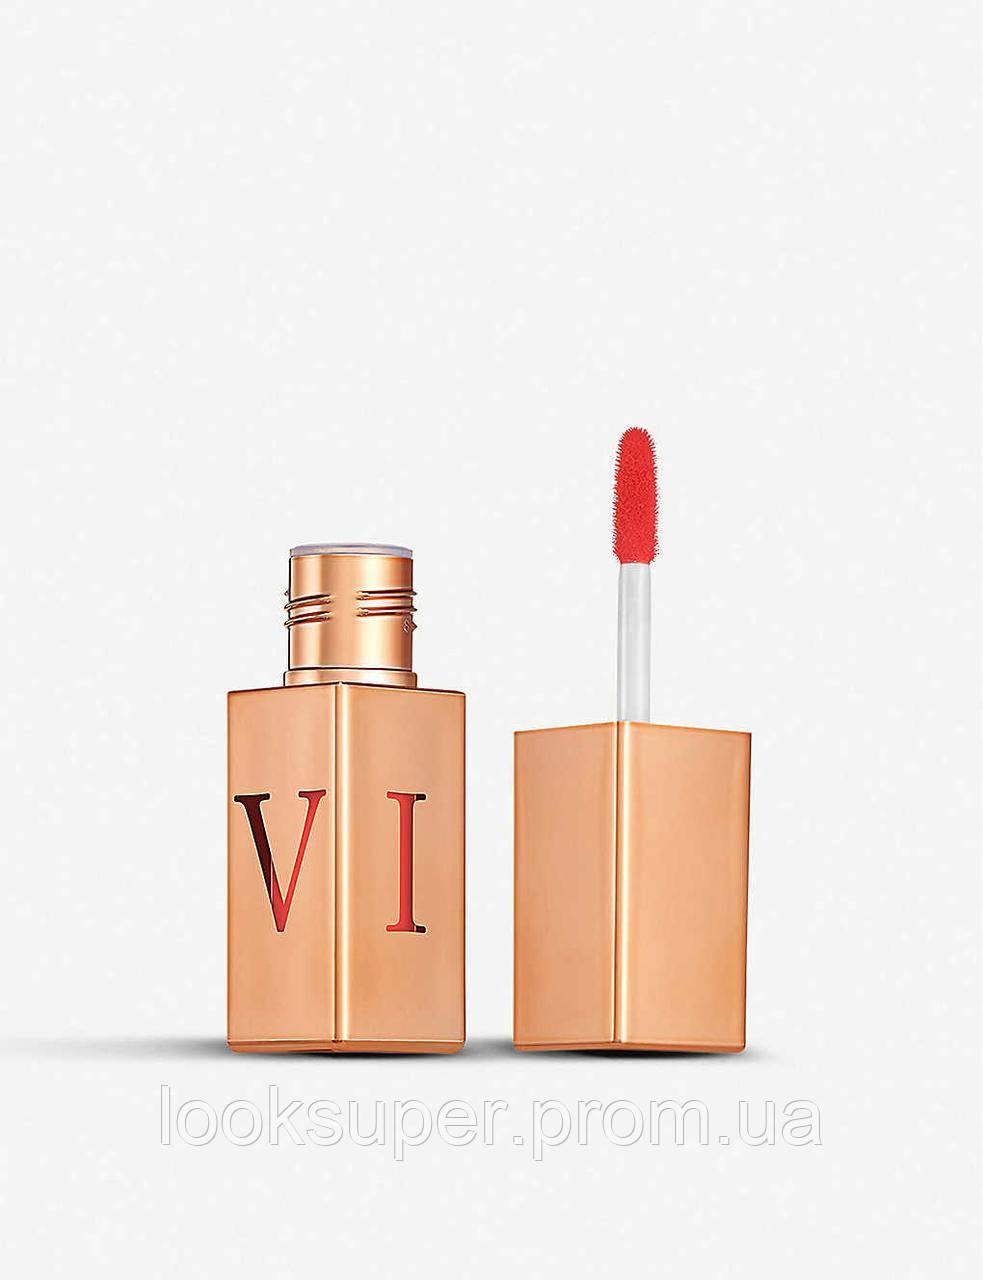 Блеск для губ Urban Decay Vice Lip Chemistry (3.5ml)